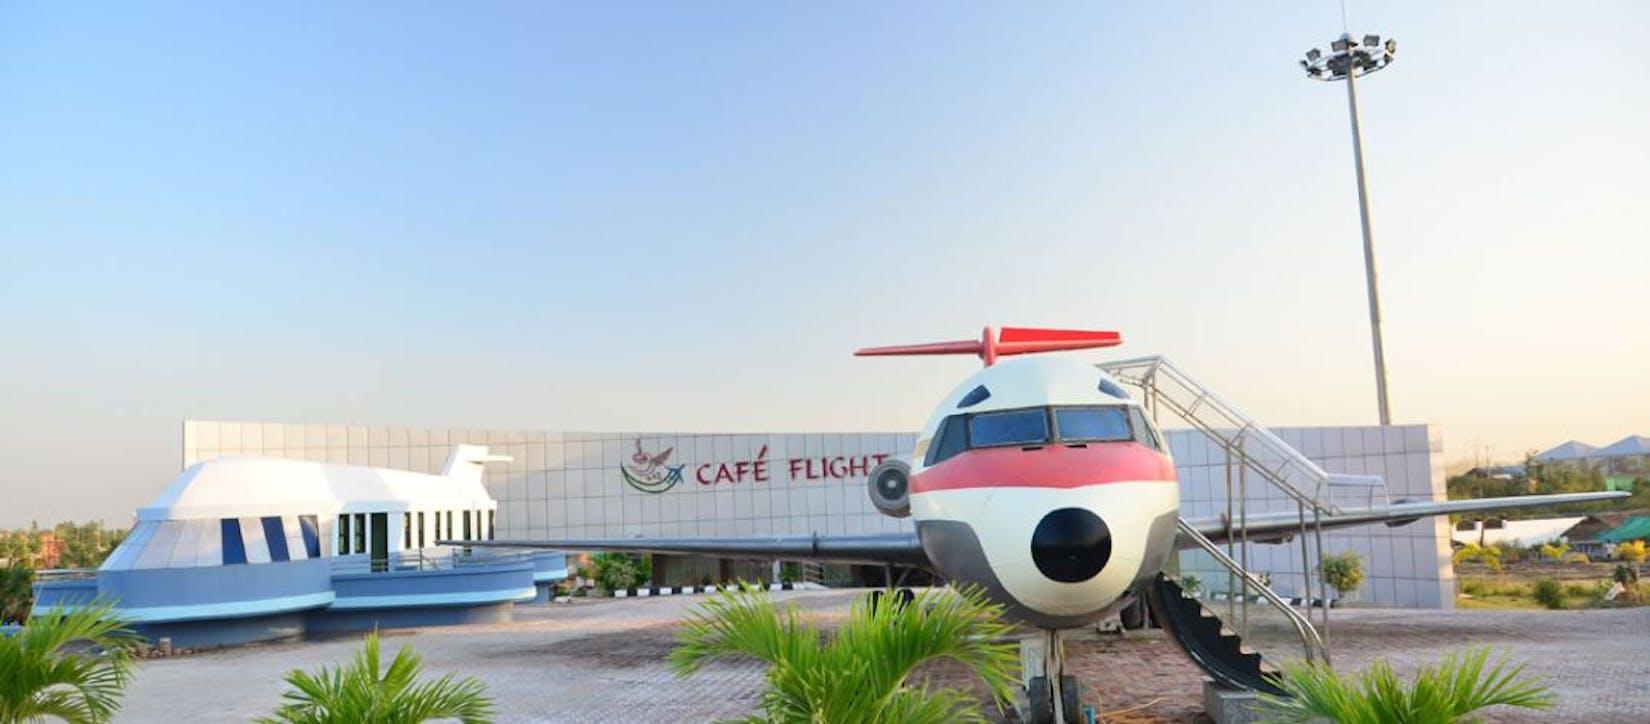 Café Flight | yathar